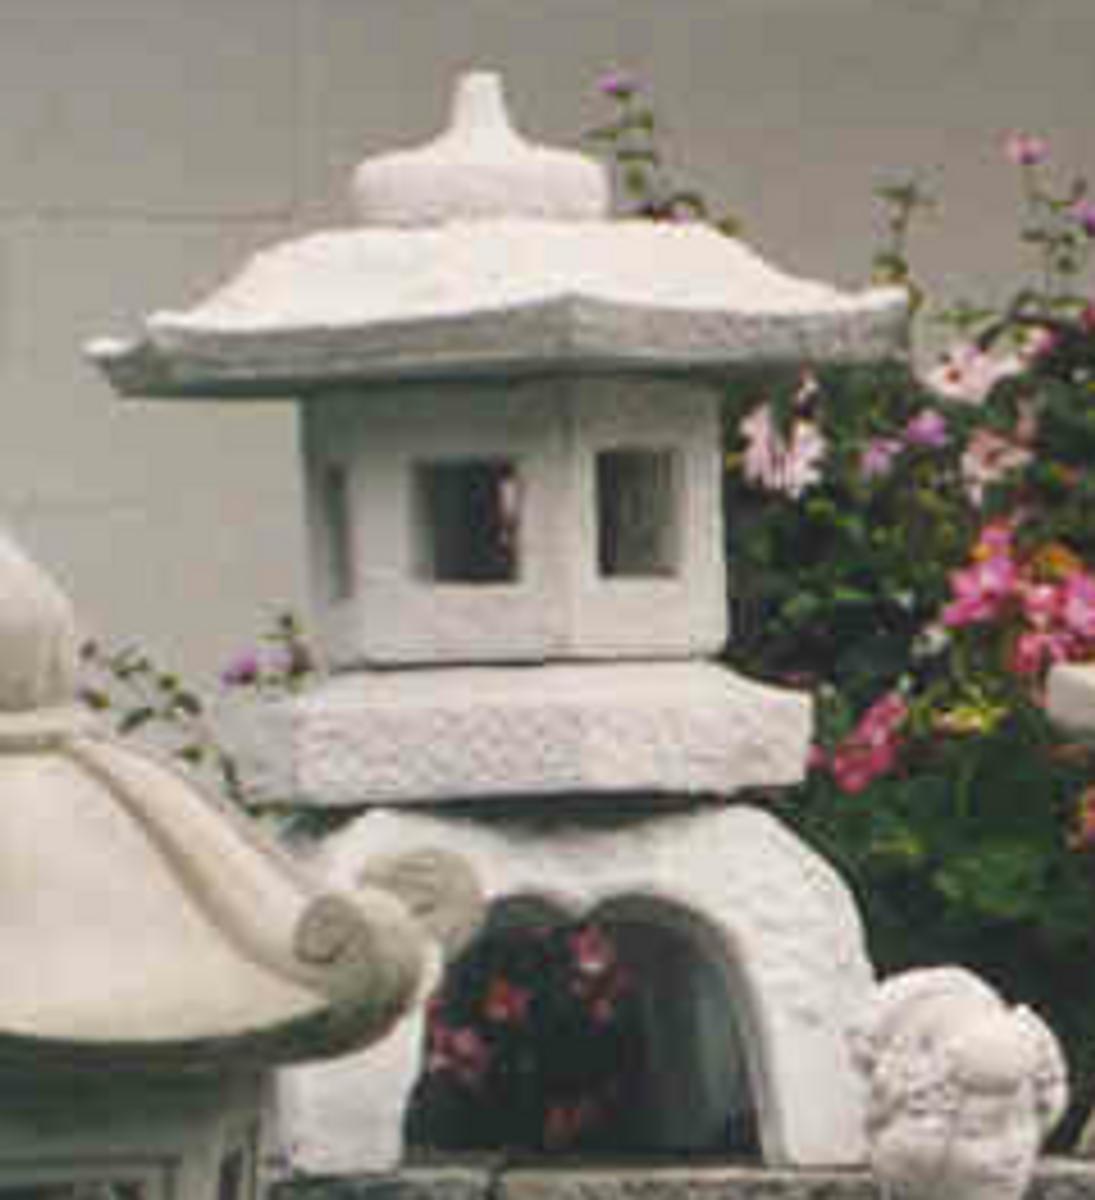 Concrete pagoda sculpture, outdoor garden decor, hand sculpted Japanese lantern statue, Japanese garden stone pagoda, antique Japanese stone lanterns, garden pagoda, Japanese post lantern.